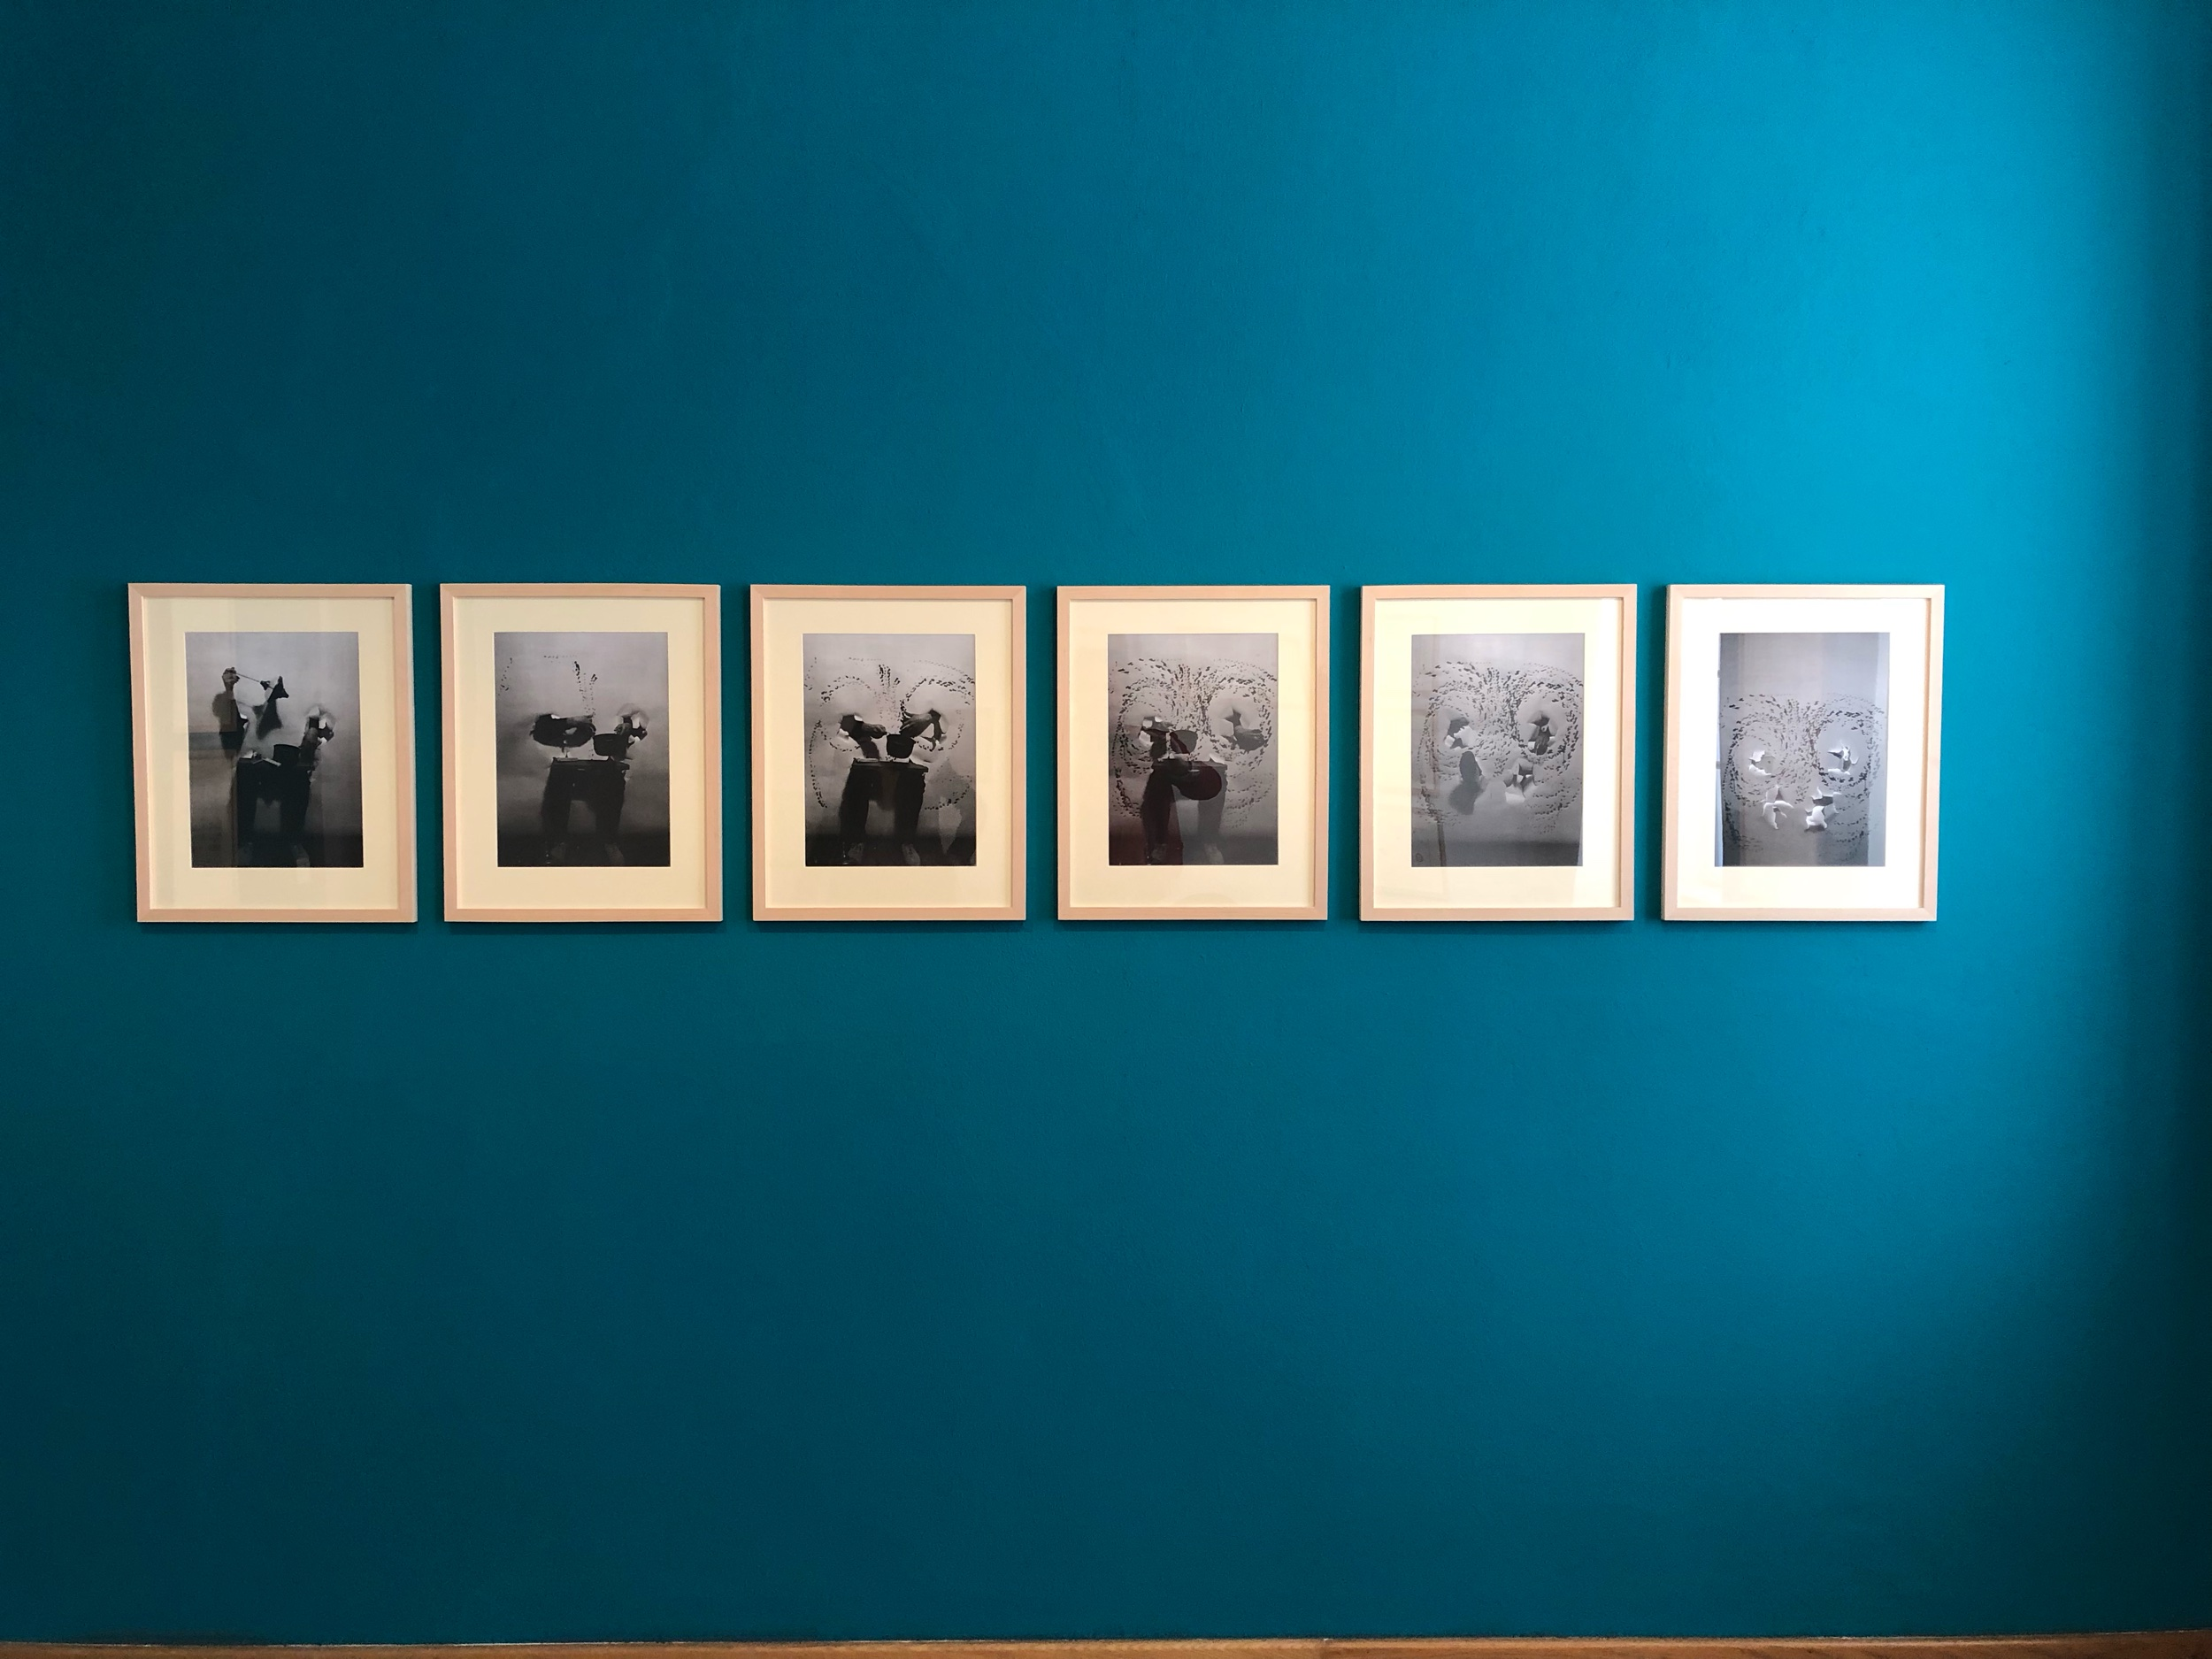 Milan Grygar, foto z výstavy